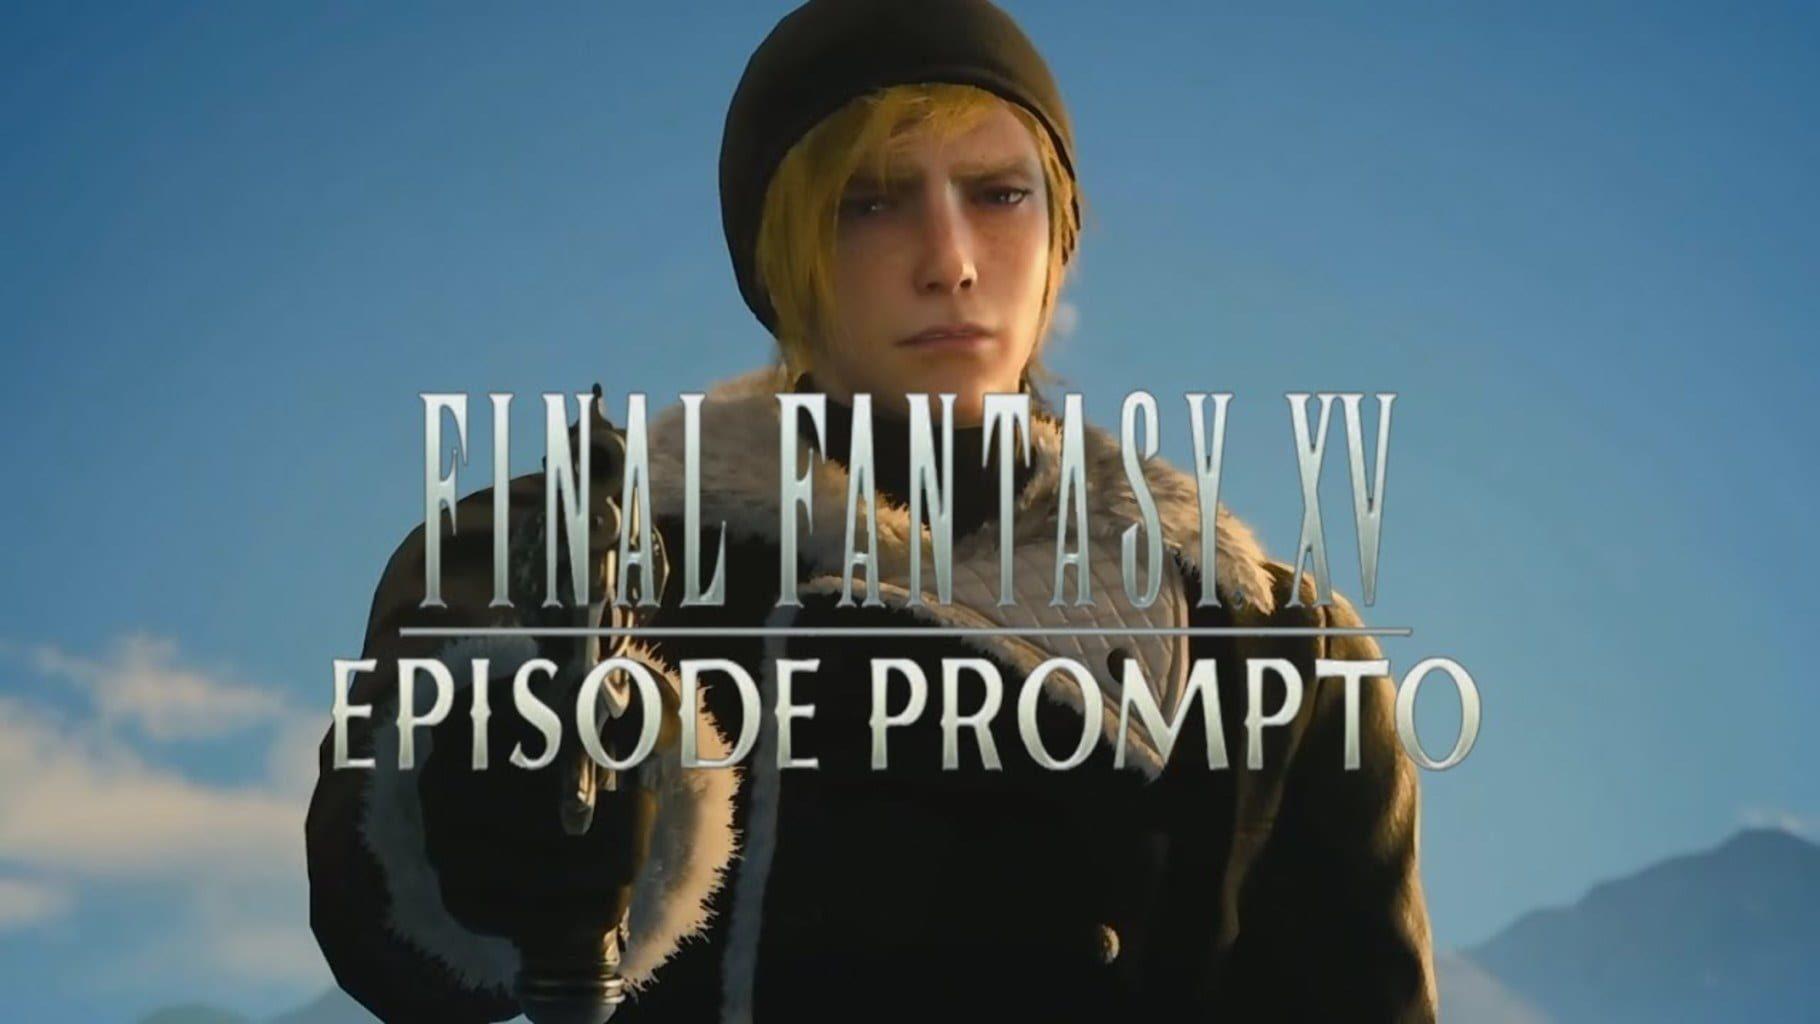 buy Final Fantasy XV: Episode Prompto cd key for all platform